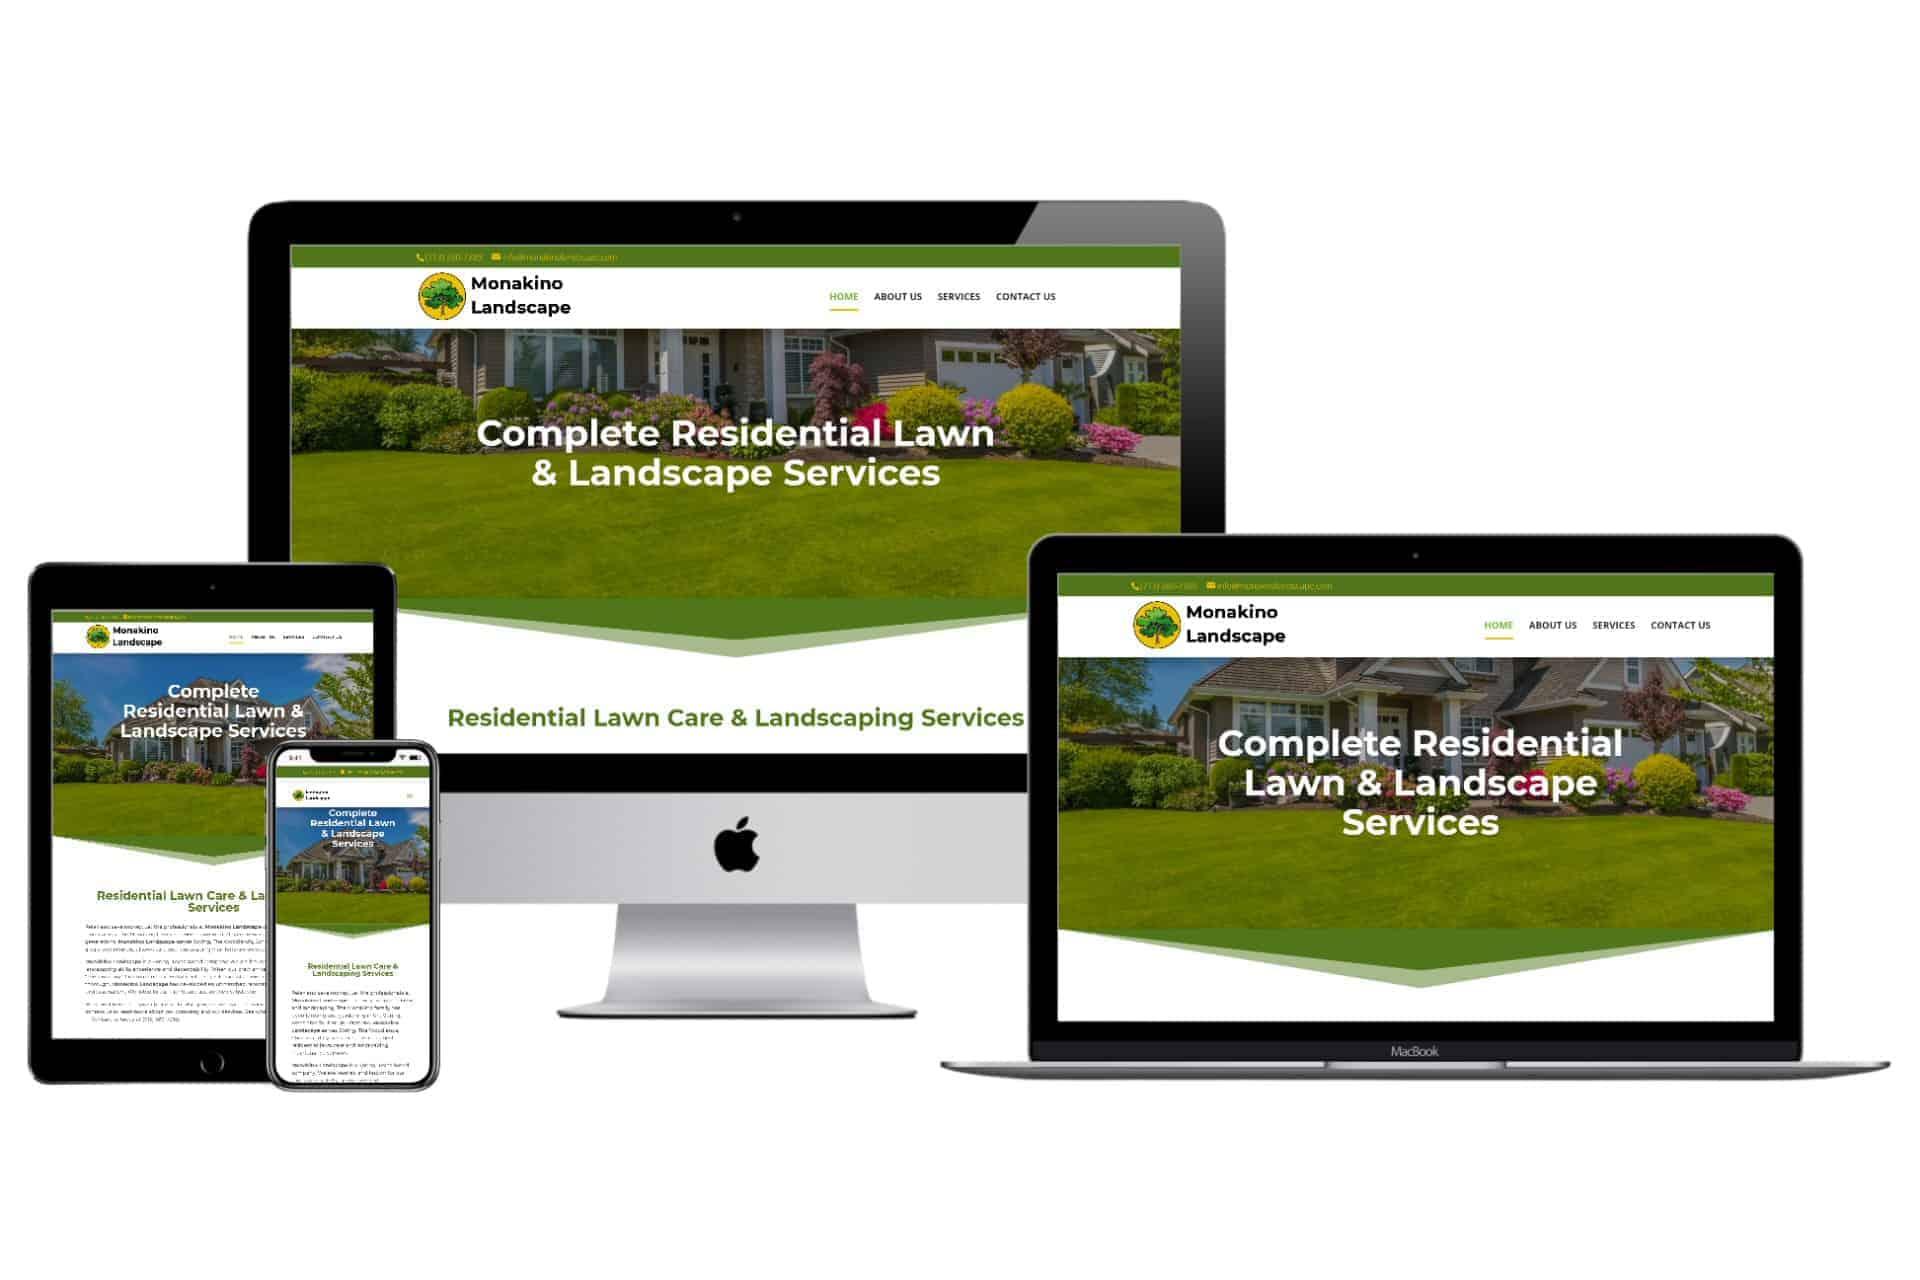 Monakino Landscape New 2020 Responsive Website Design